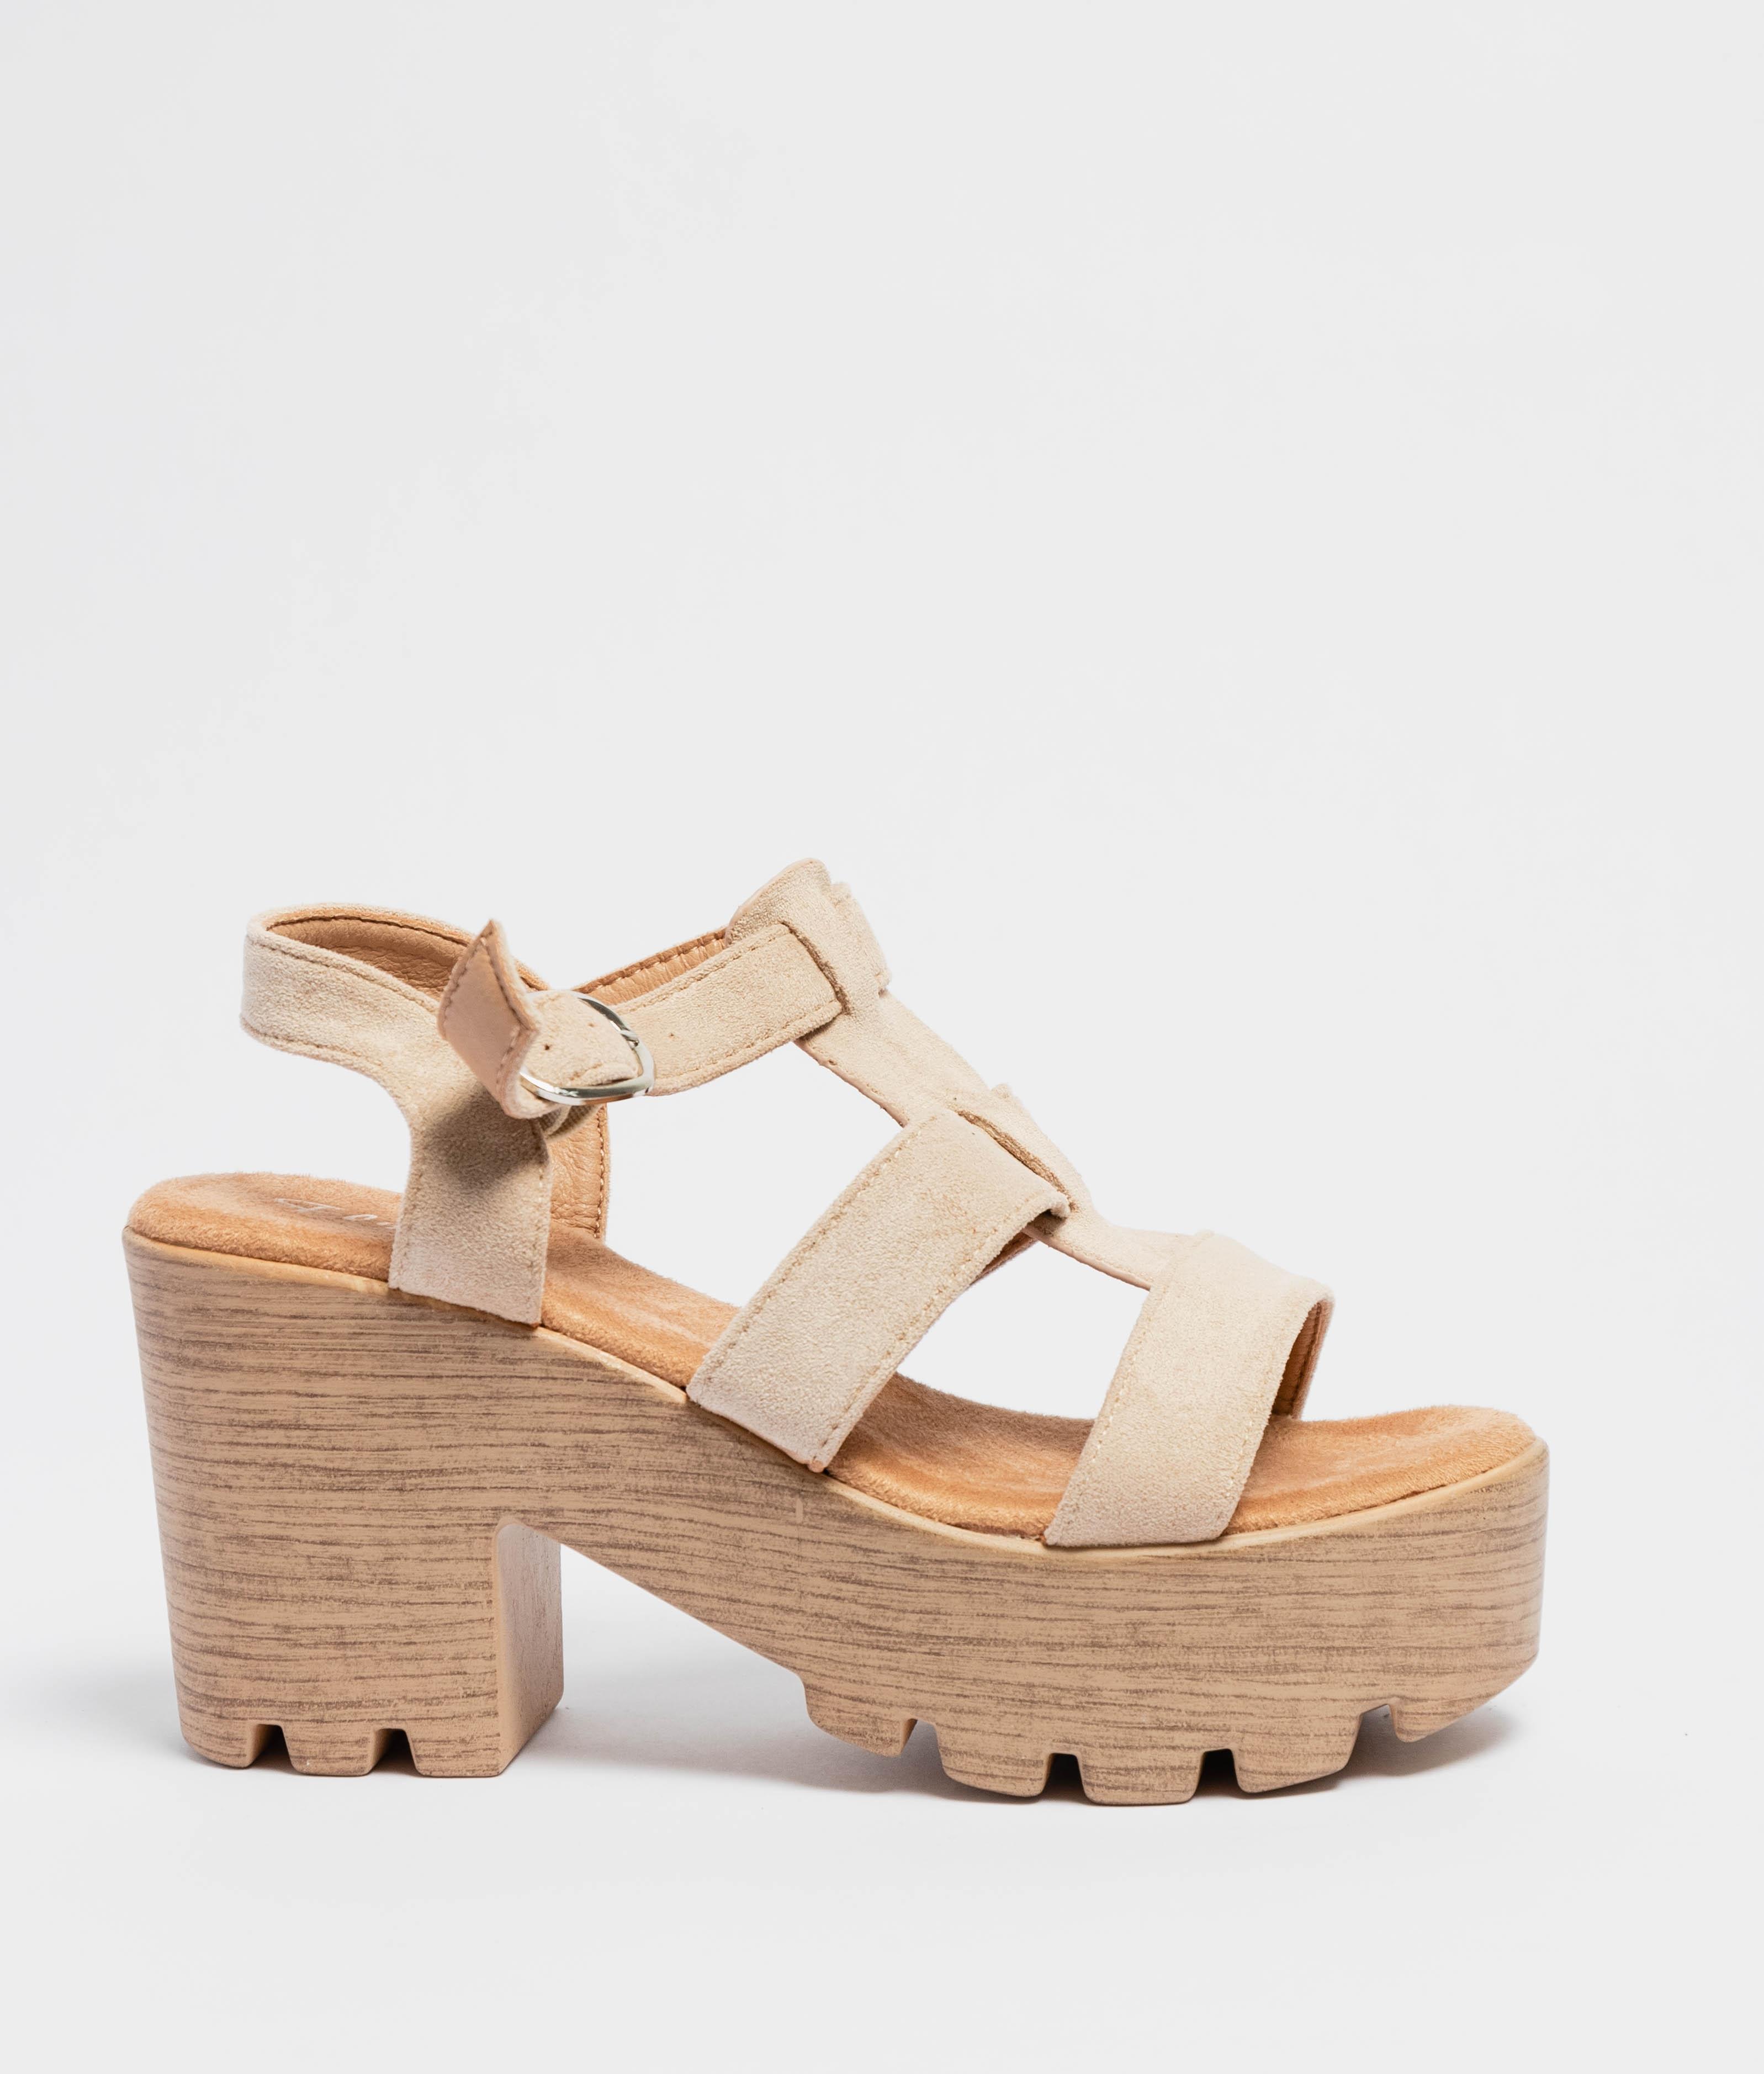 Sandale Talon Nevas - Beige